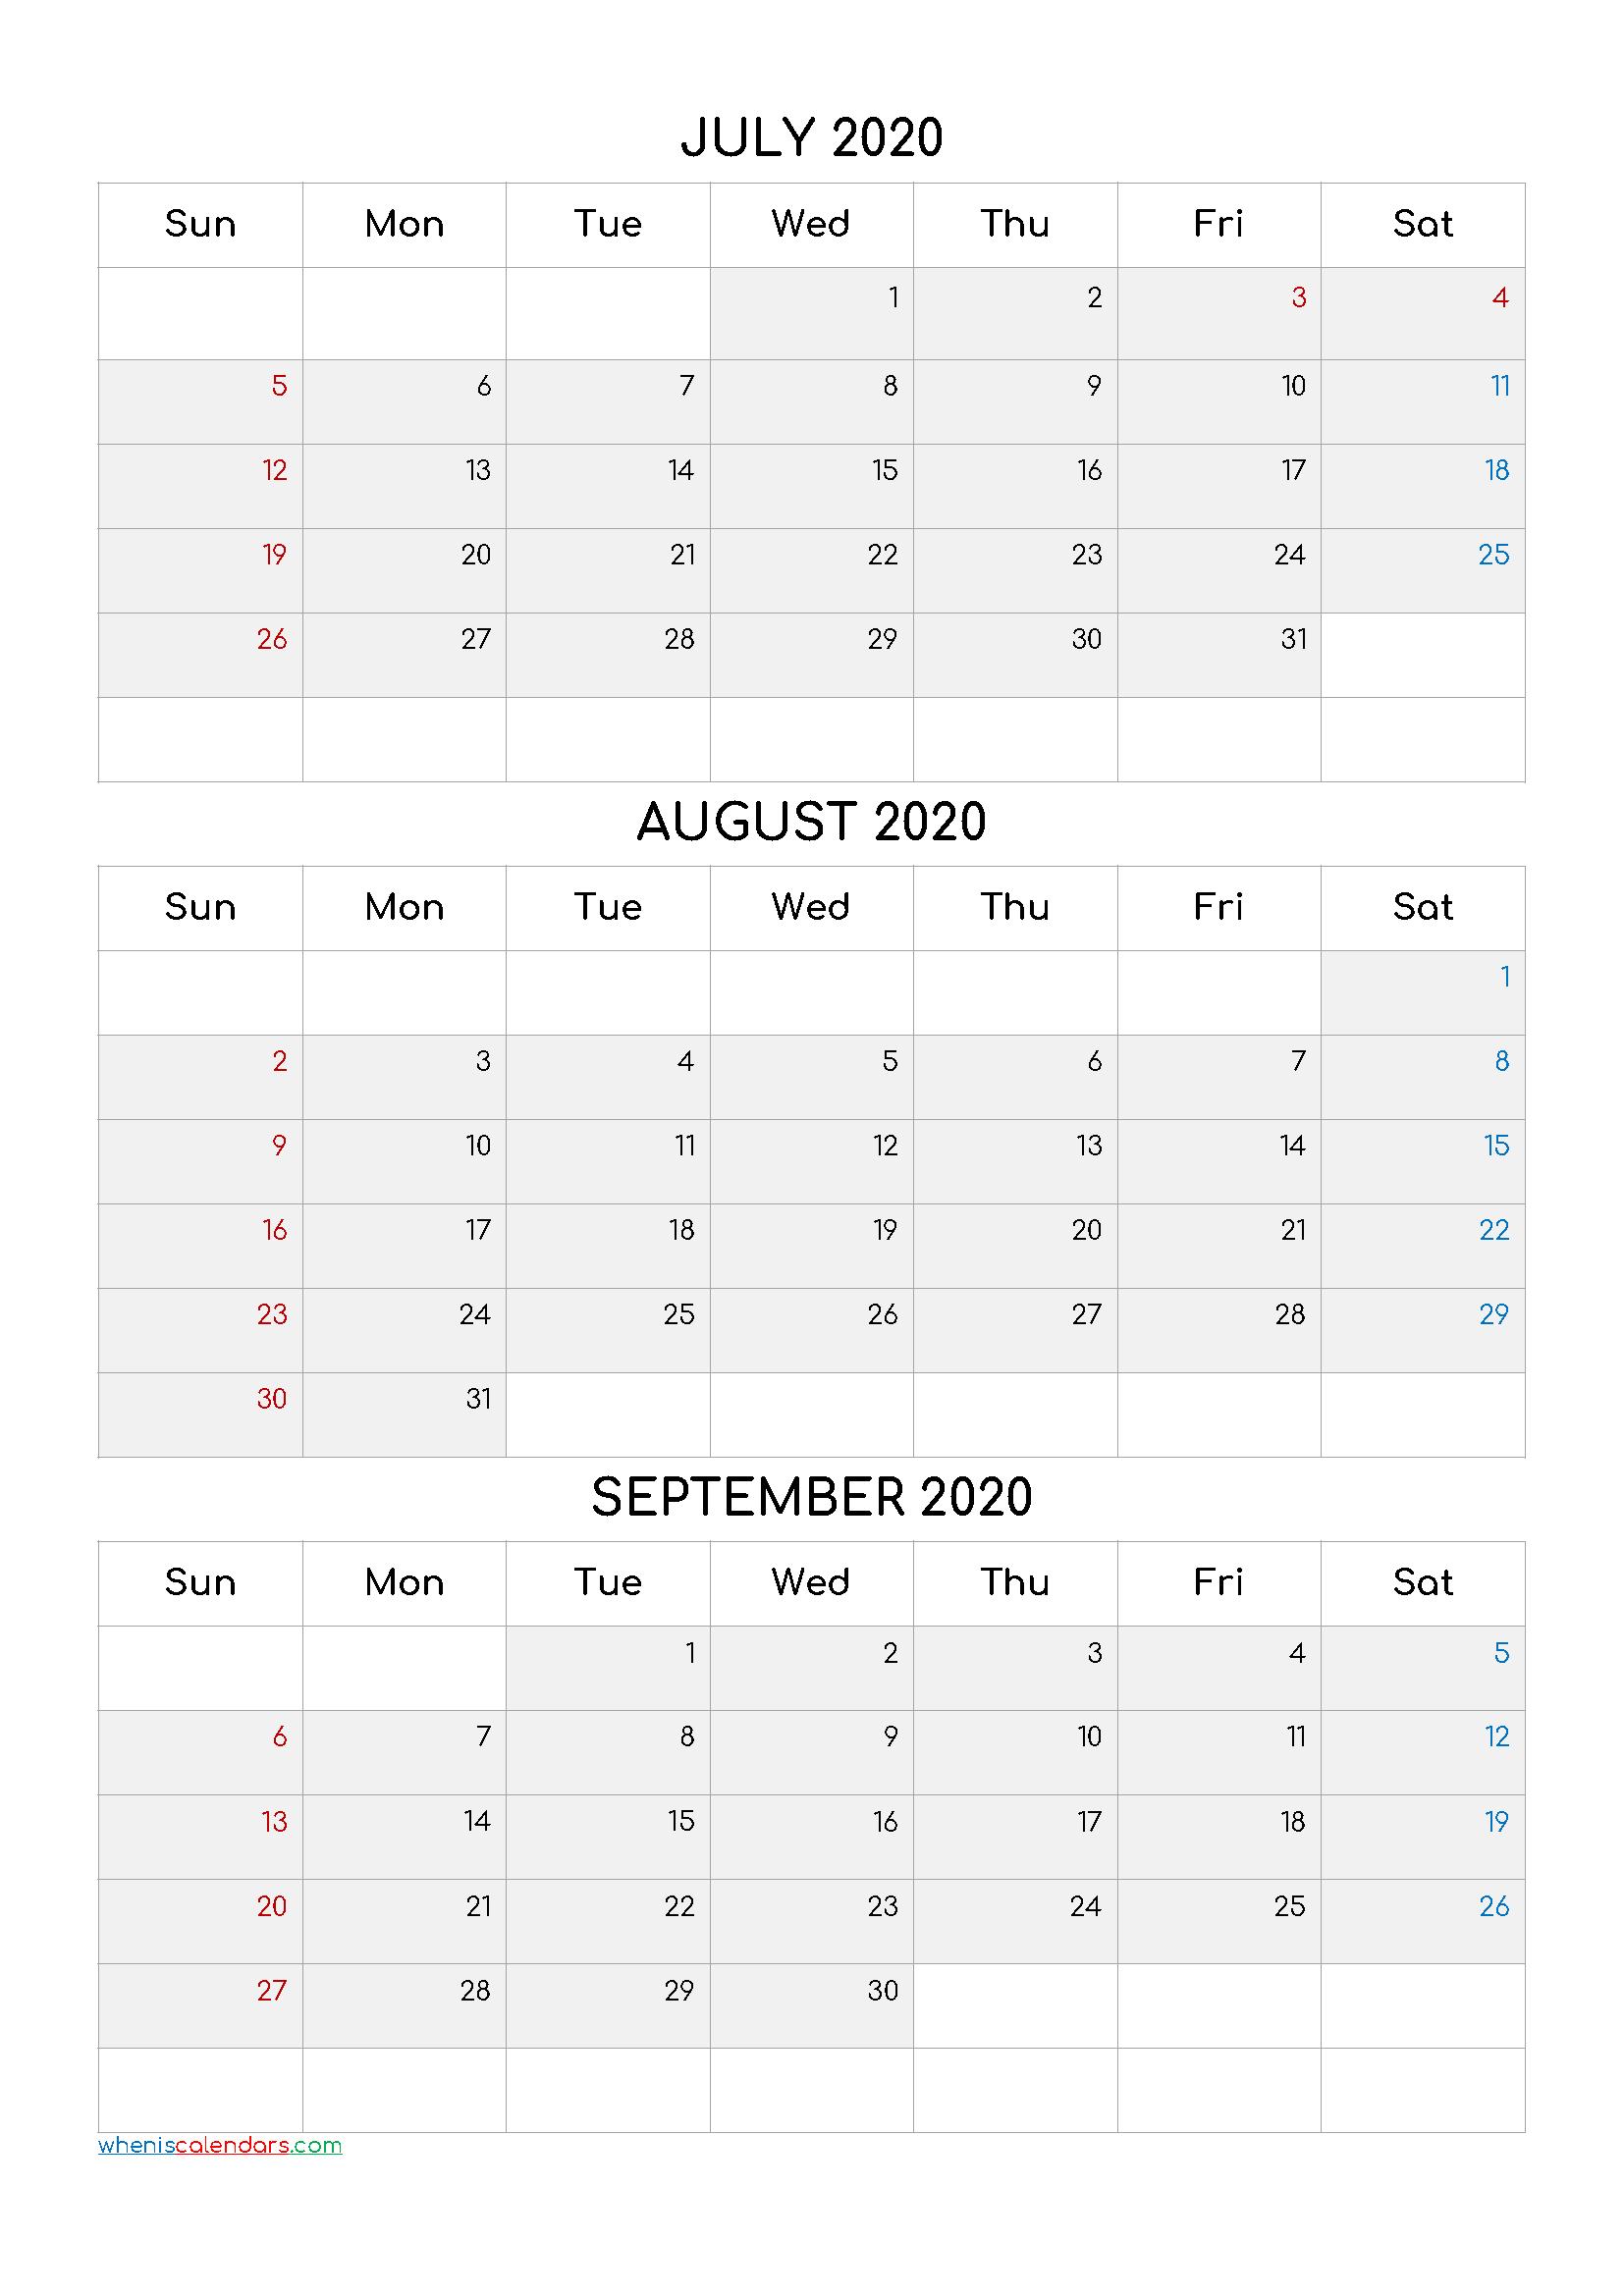 Printable 3 Month Calendar July August September 2020